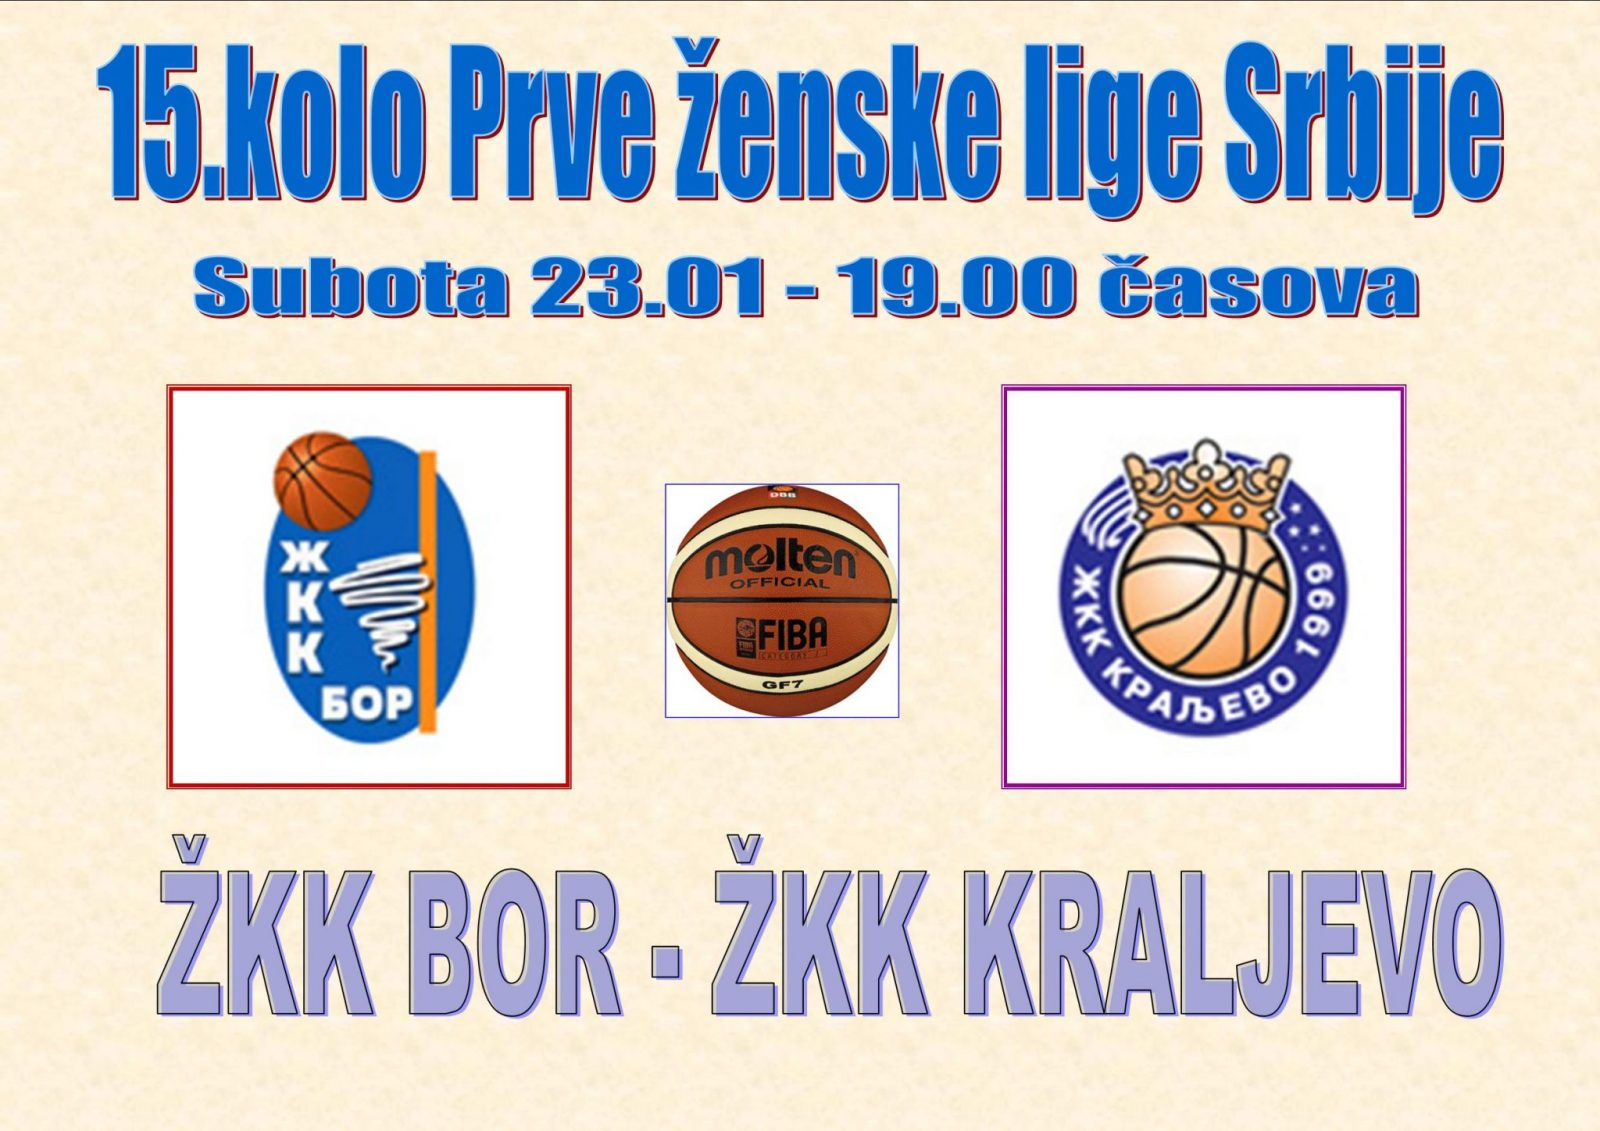 Subota 19.00 časova: Prva ženska liga Srbije; 15.kolo - ŽKK BOR - ŽKK Kraljevo